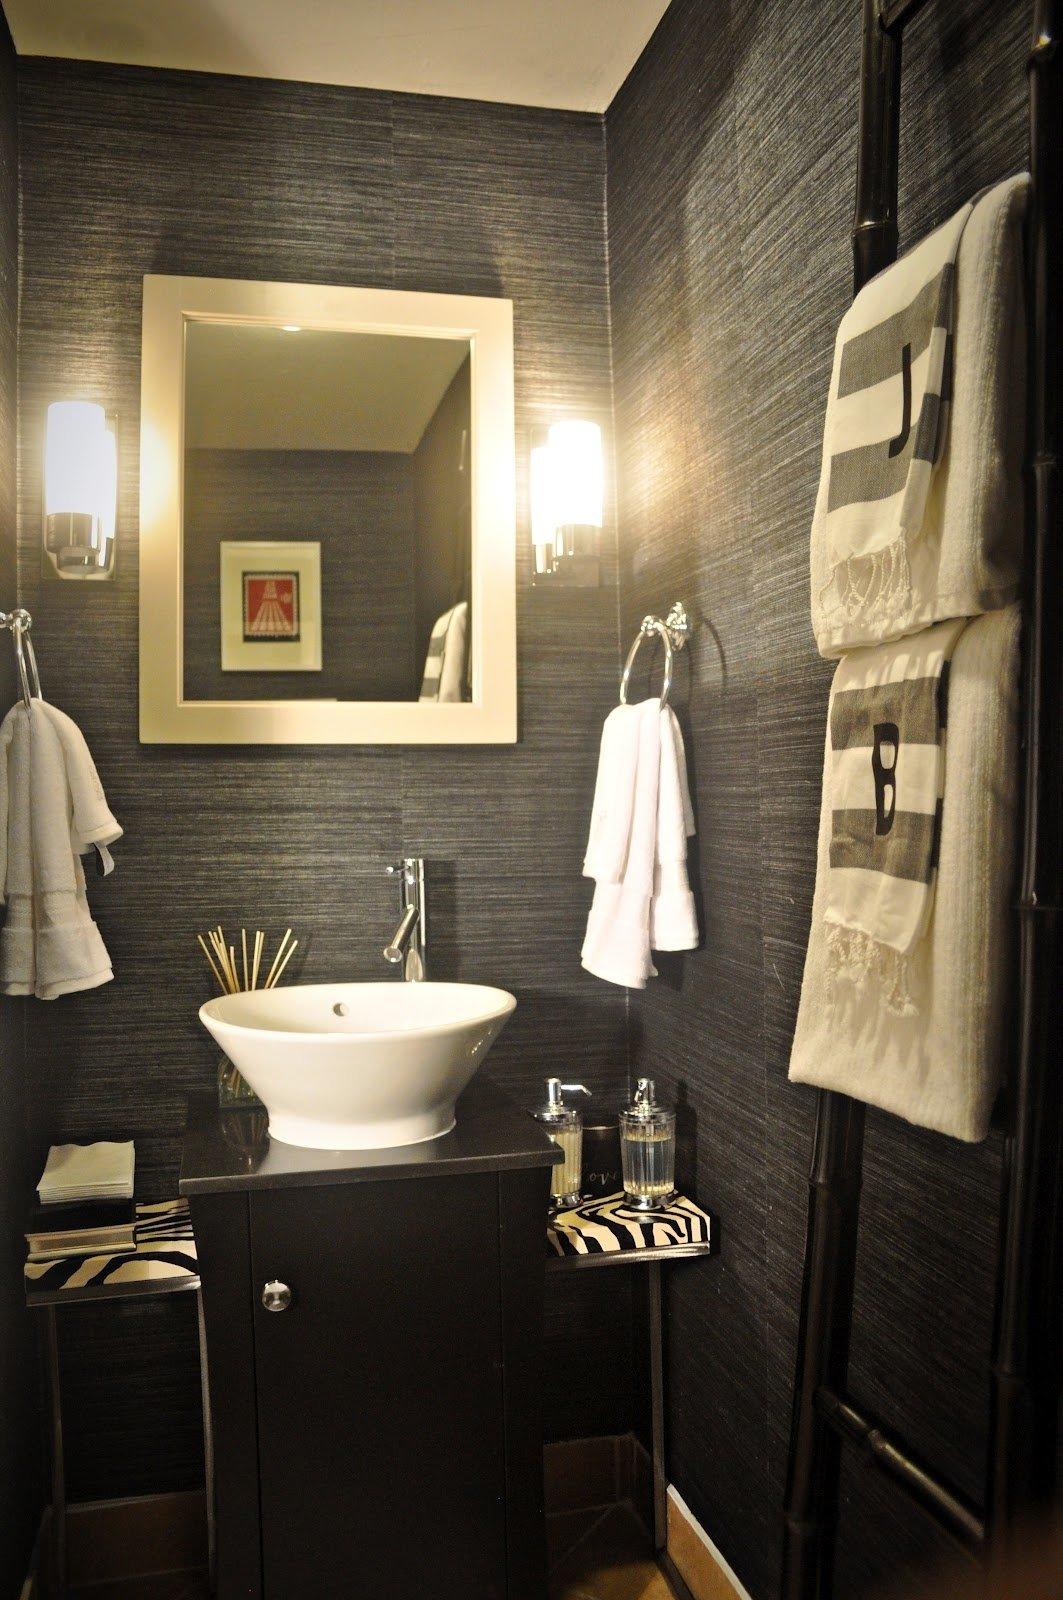 10 Ideal Small Powder Room Decorating Ideas interior powder bath color ideas small lighting bathroom 2020